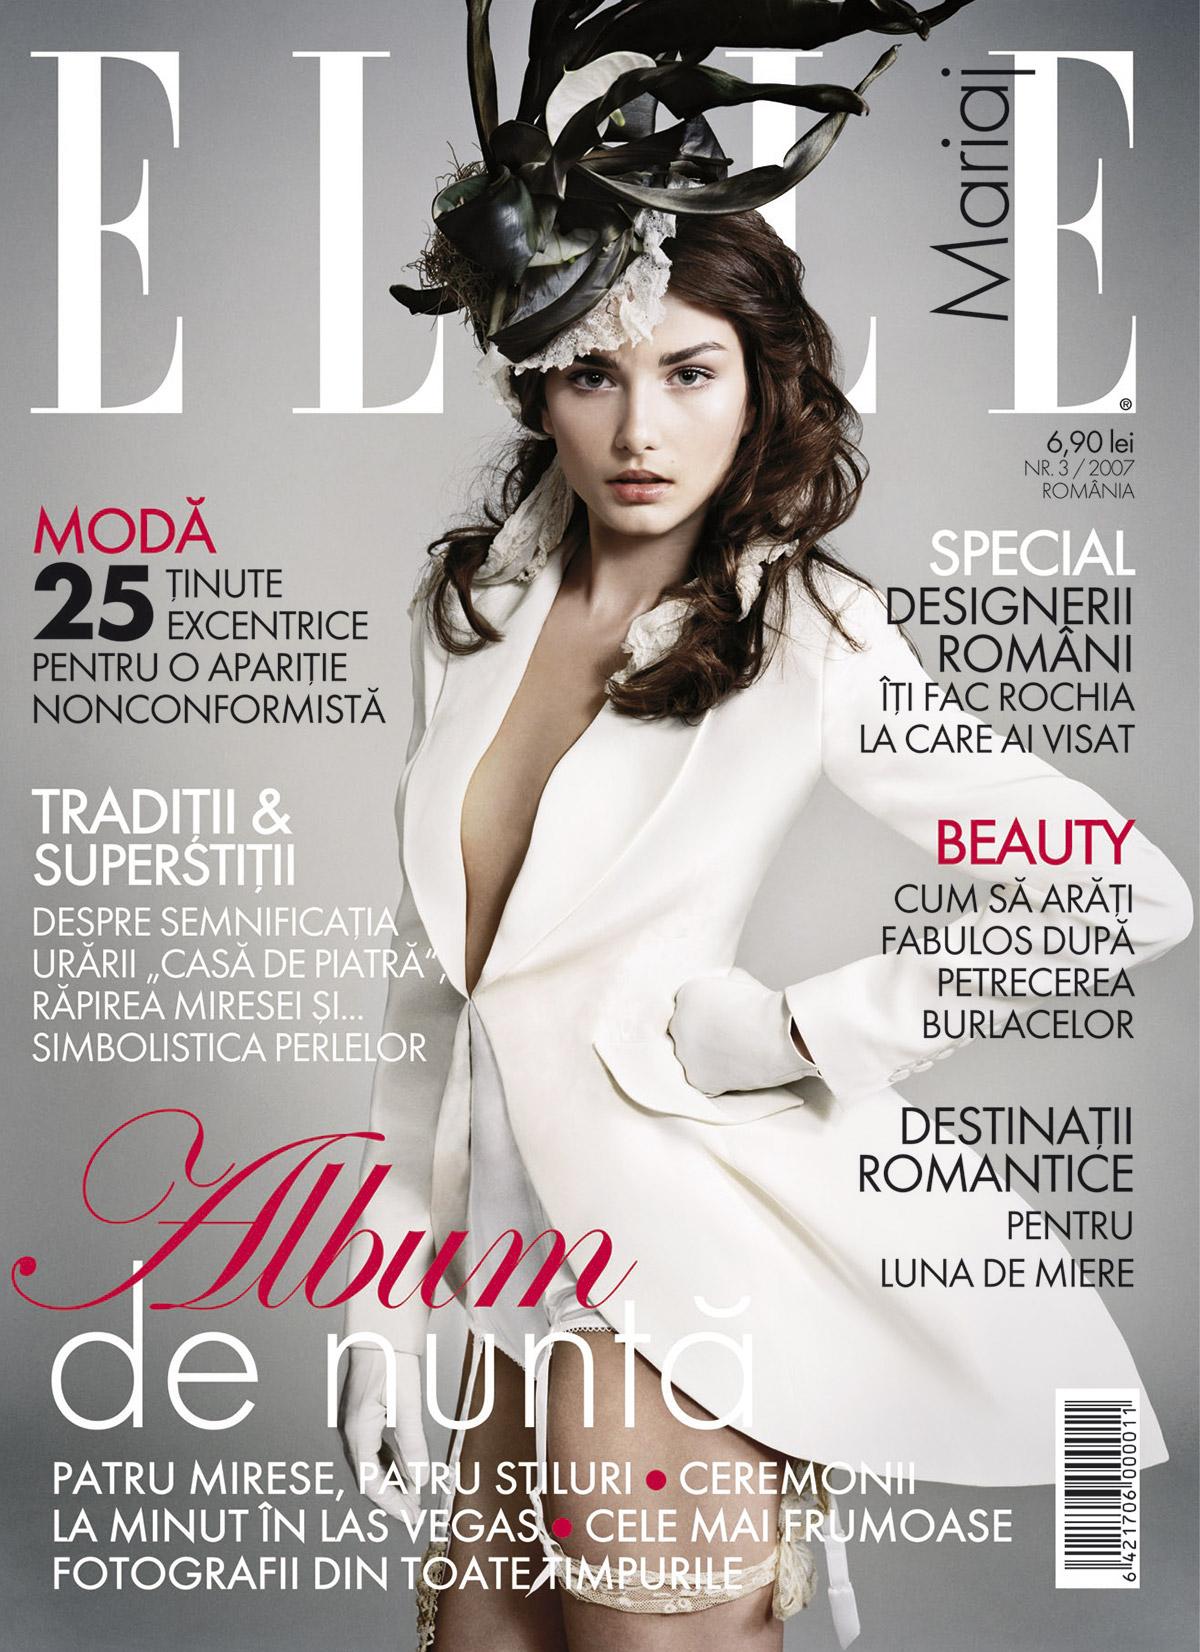 Cover-Mariaj-ian-08.jpg